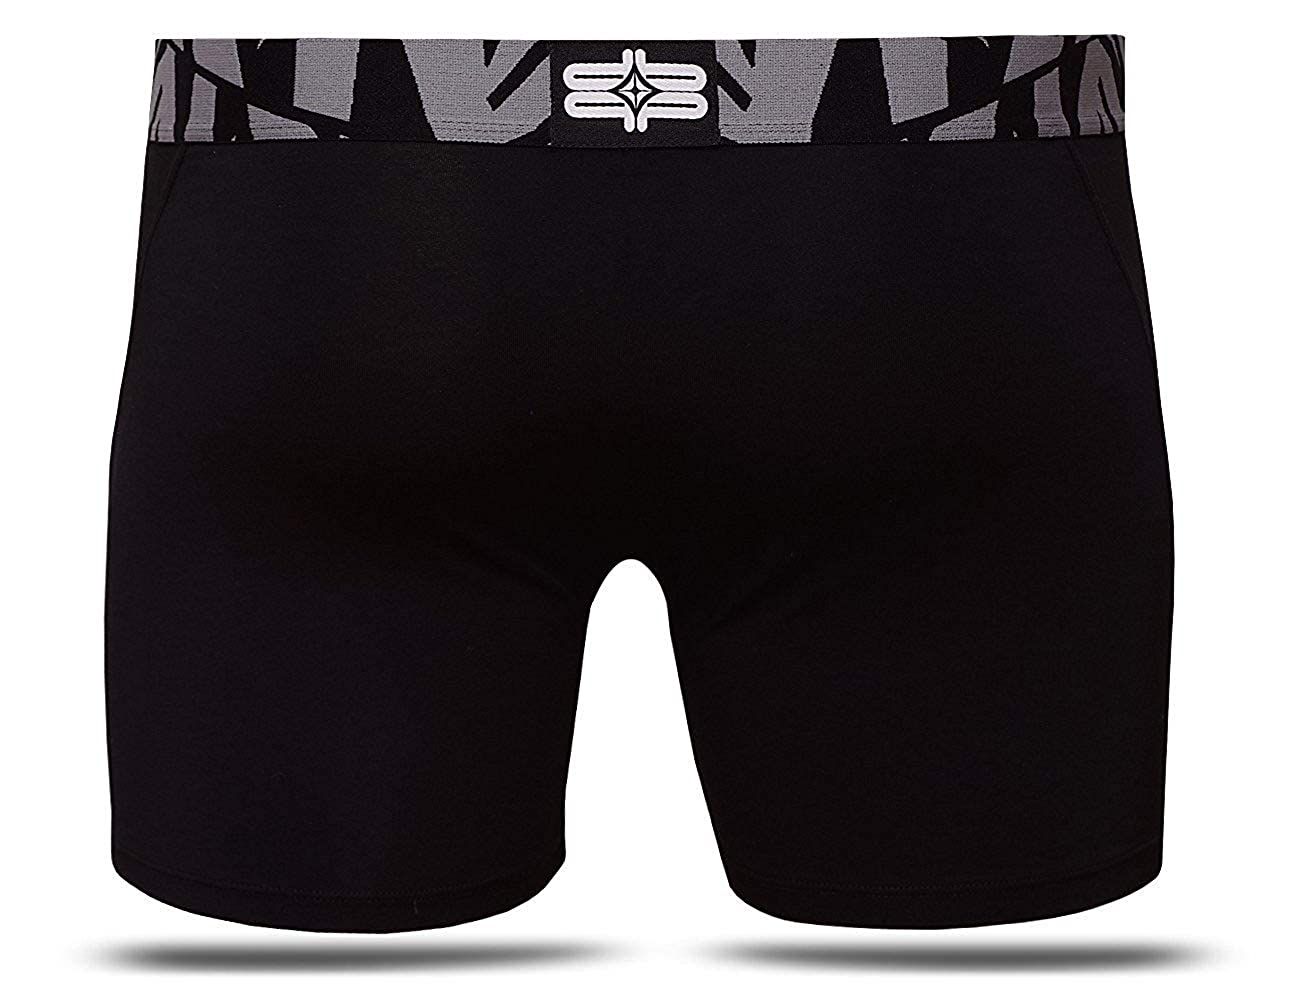 Uomo Pepp Underwear Boxer